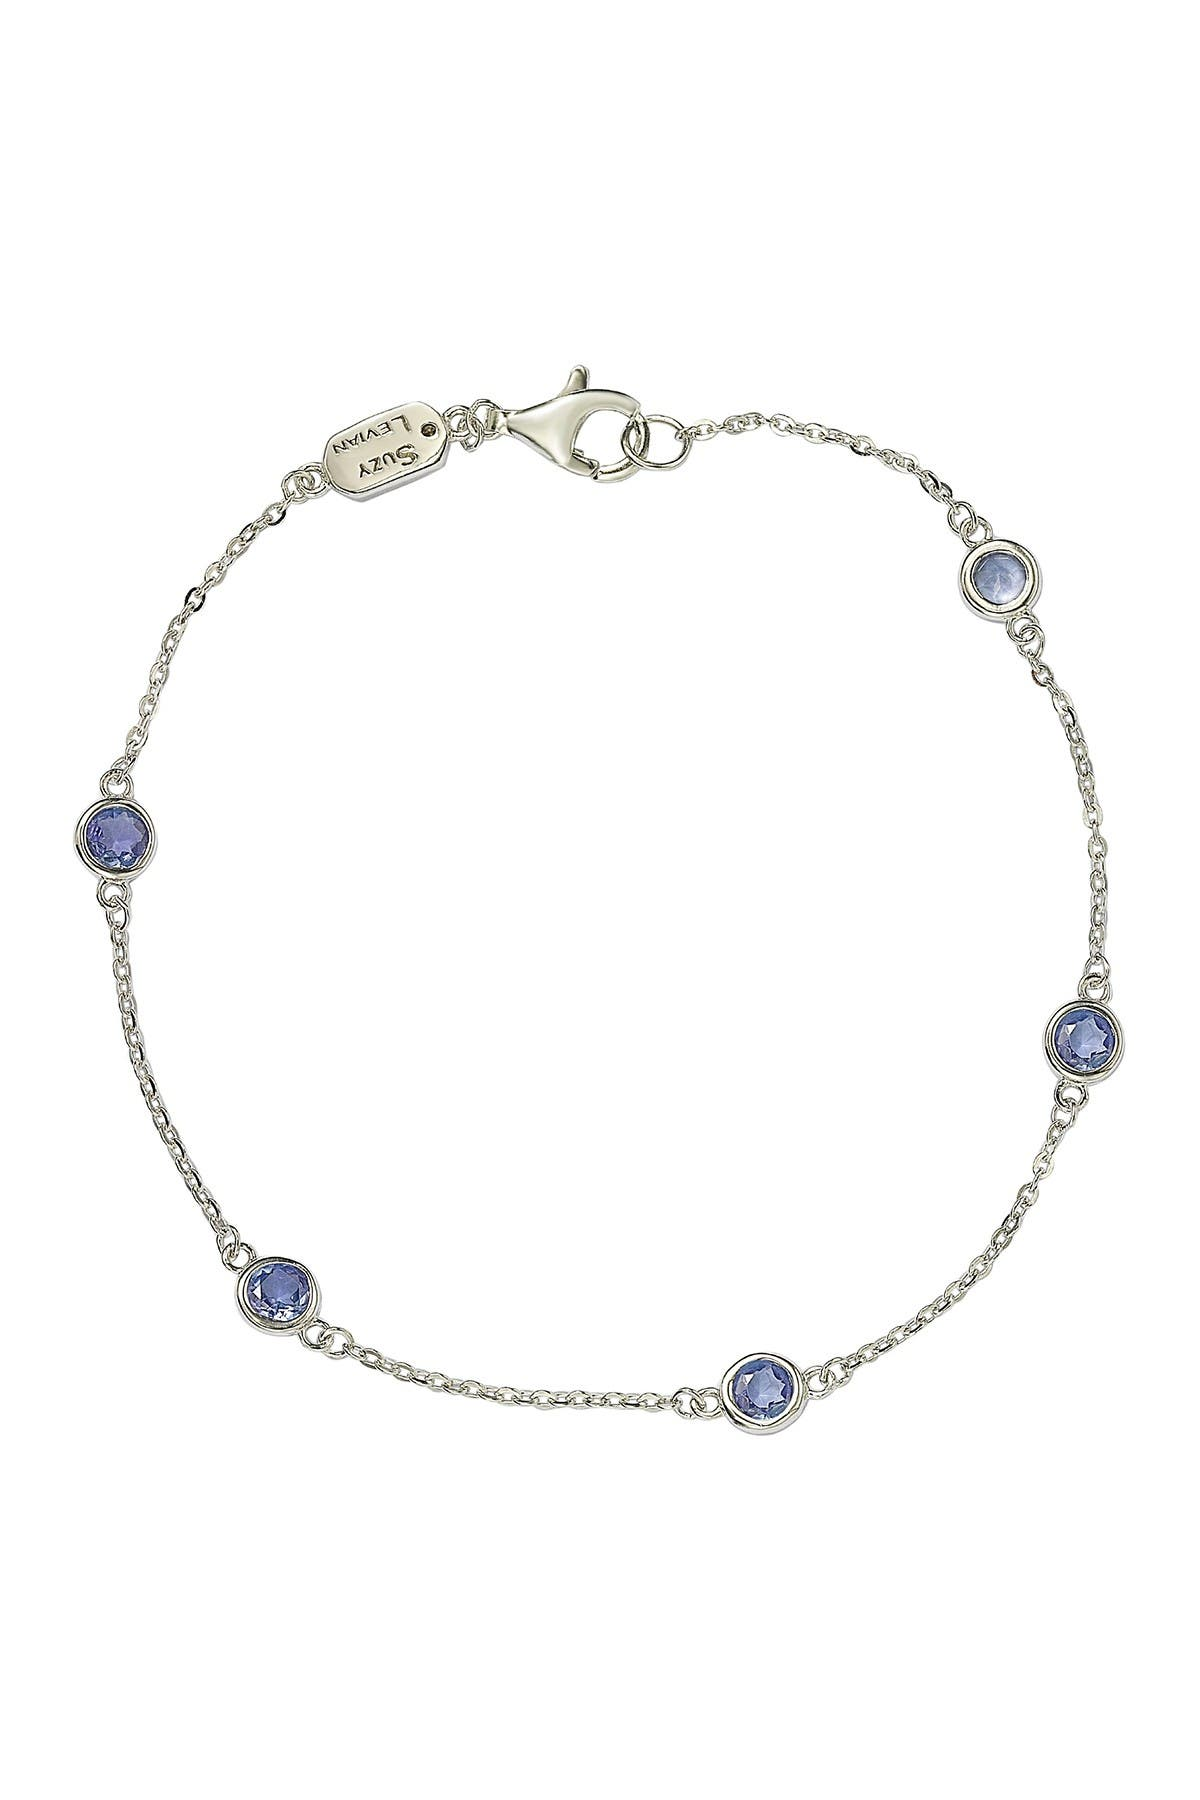 Image of Suzy Levian Sterling Silver Bezel Set Tanzanite Station Bracelet - 0.15 ctw